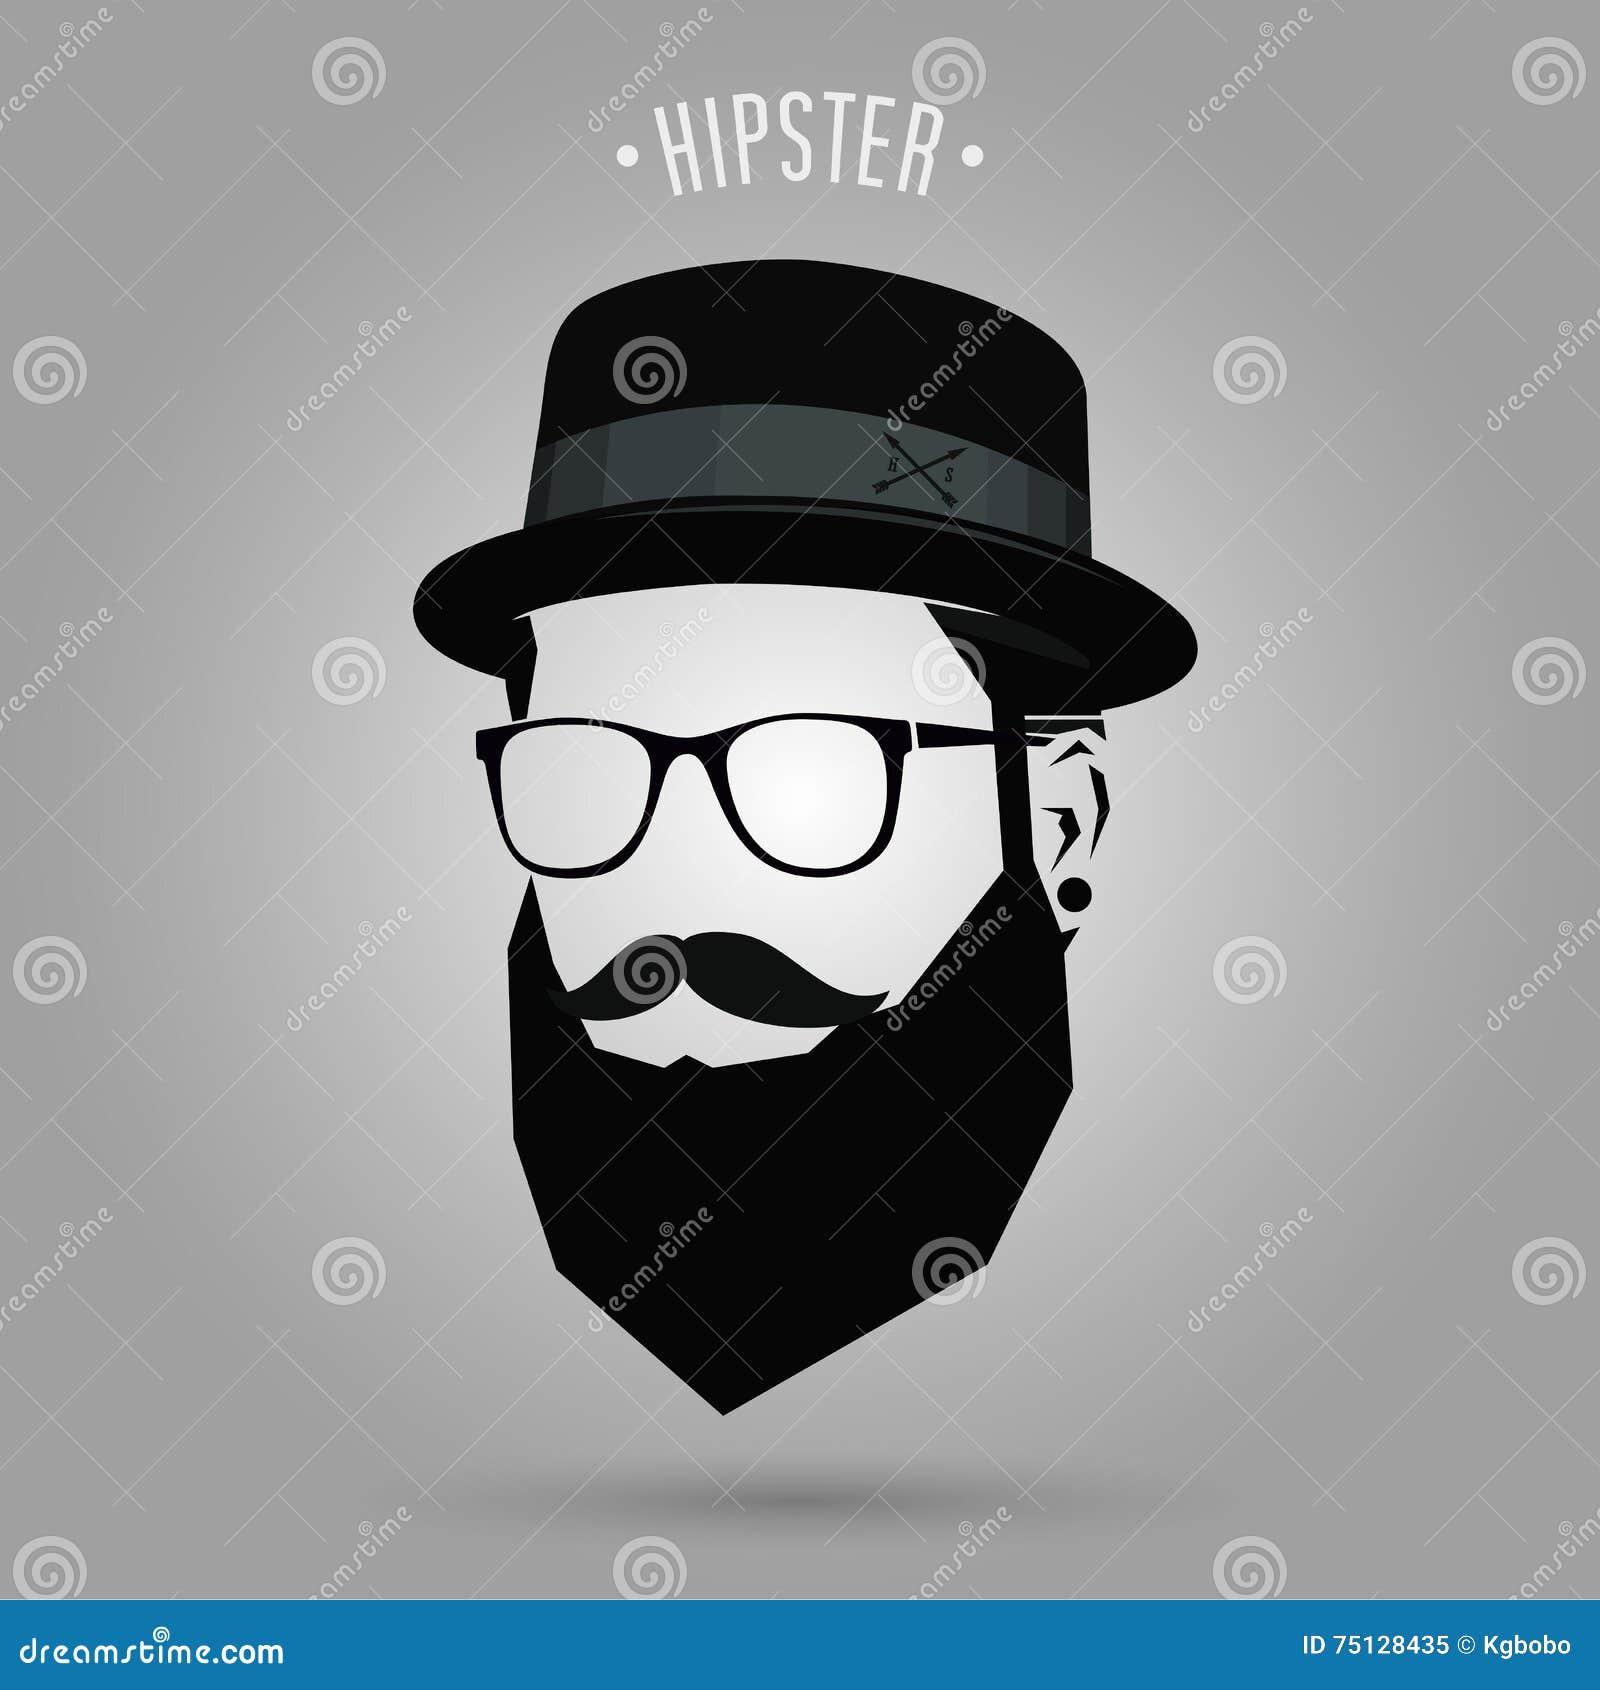 Hipster sign hat